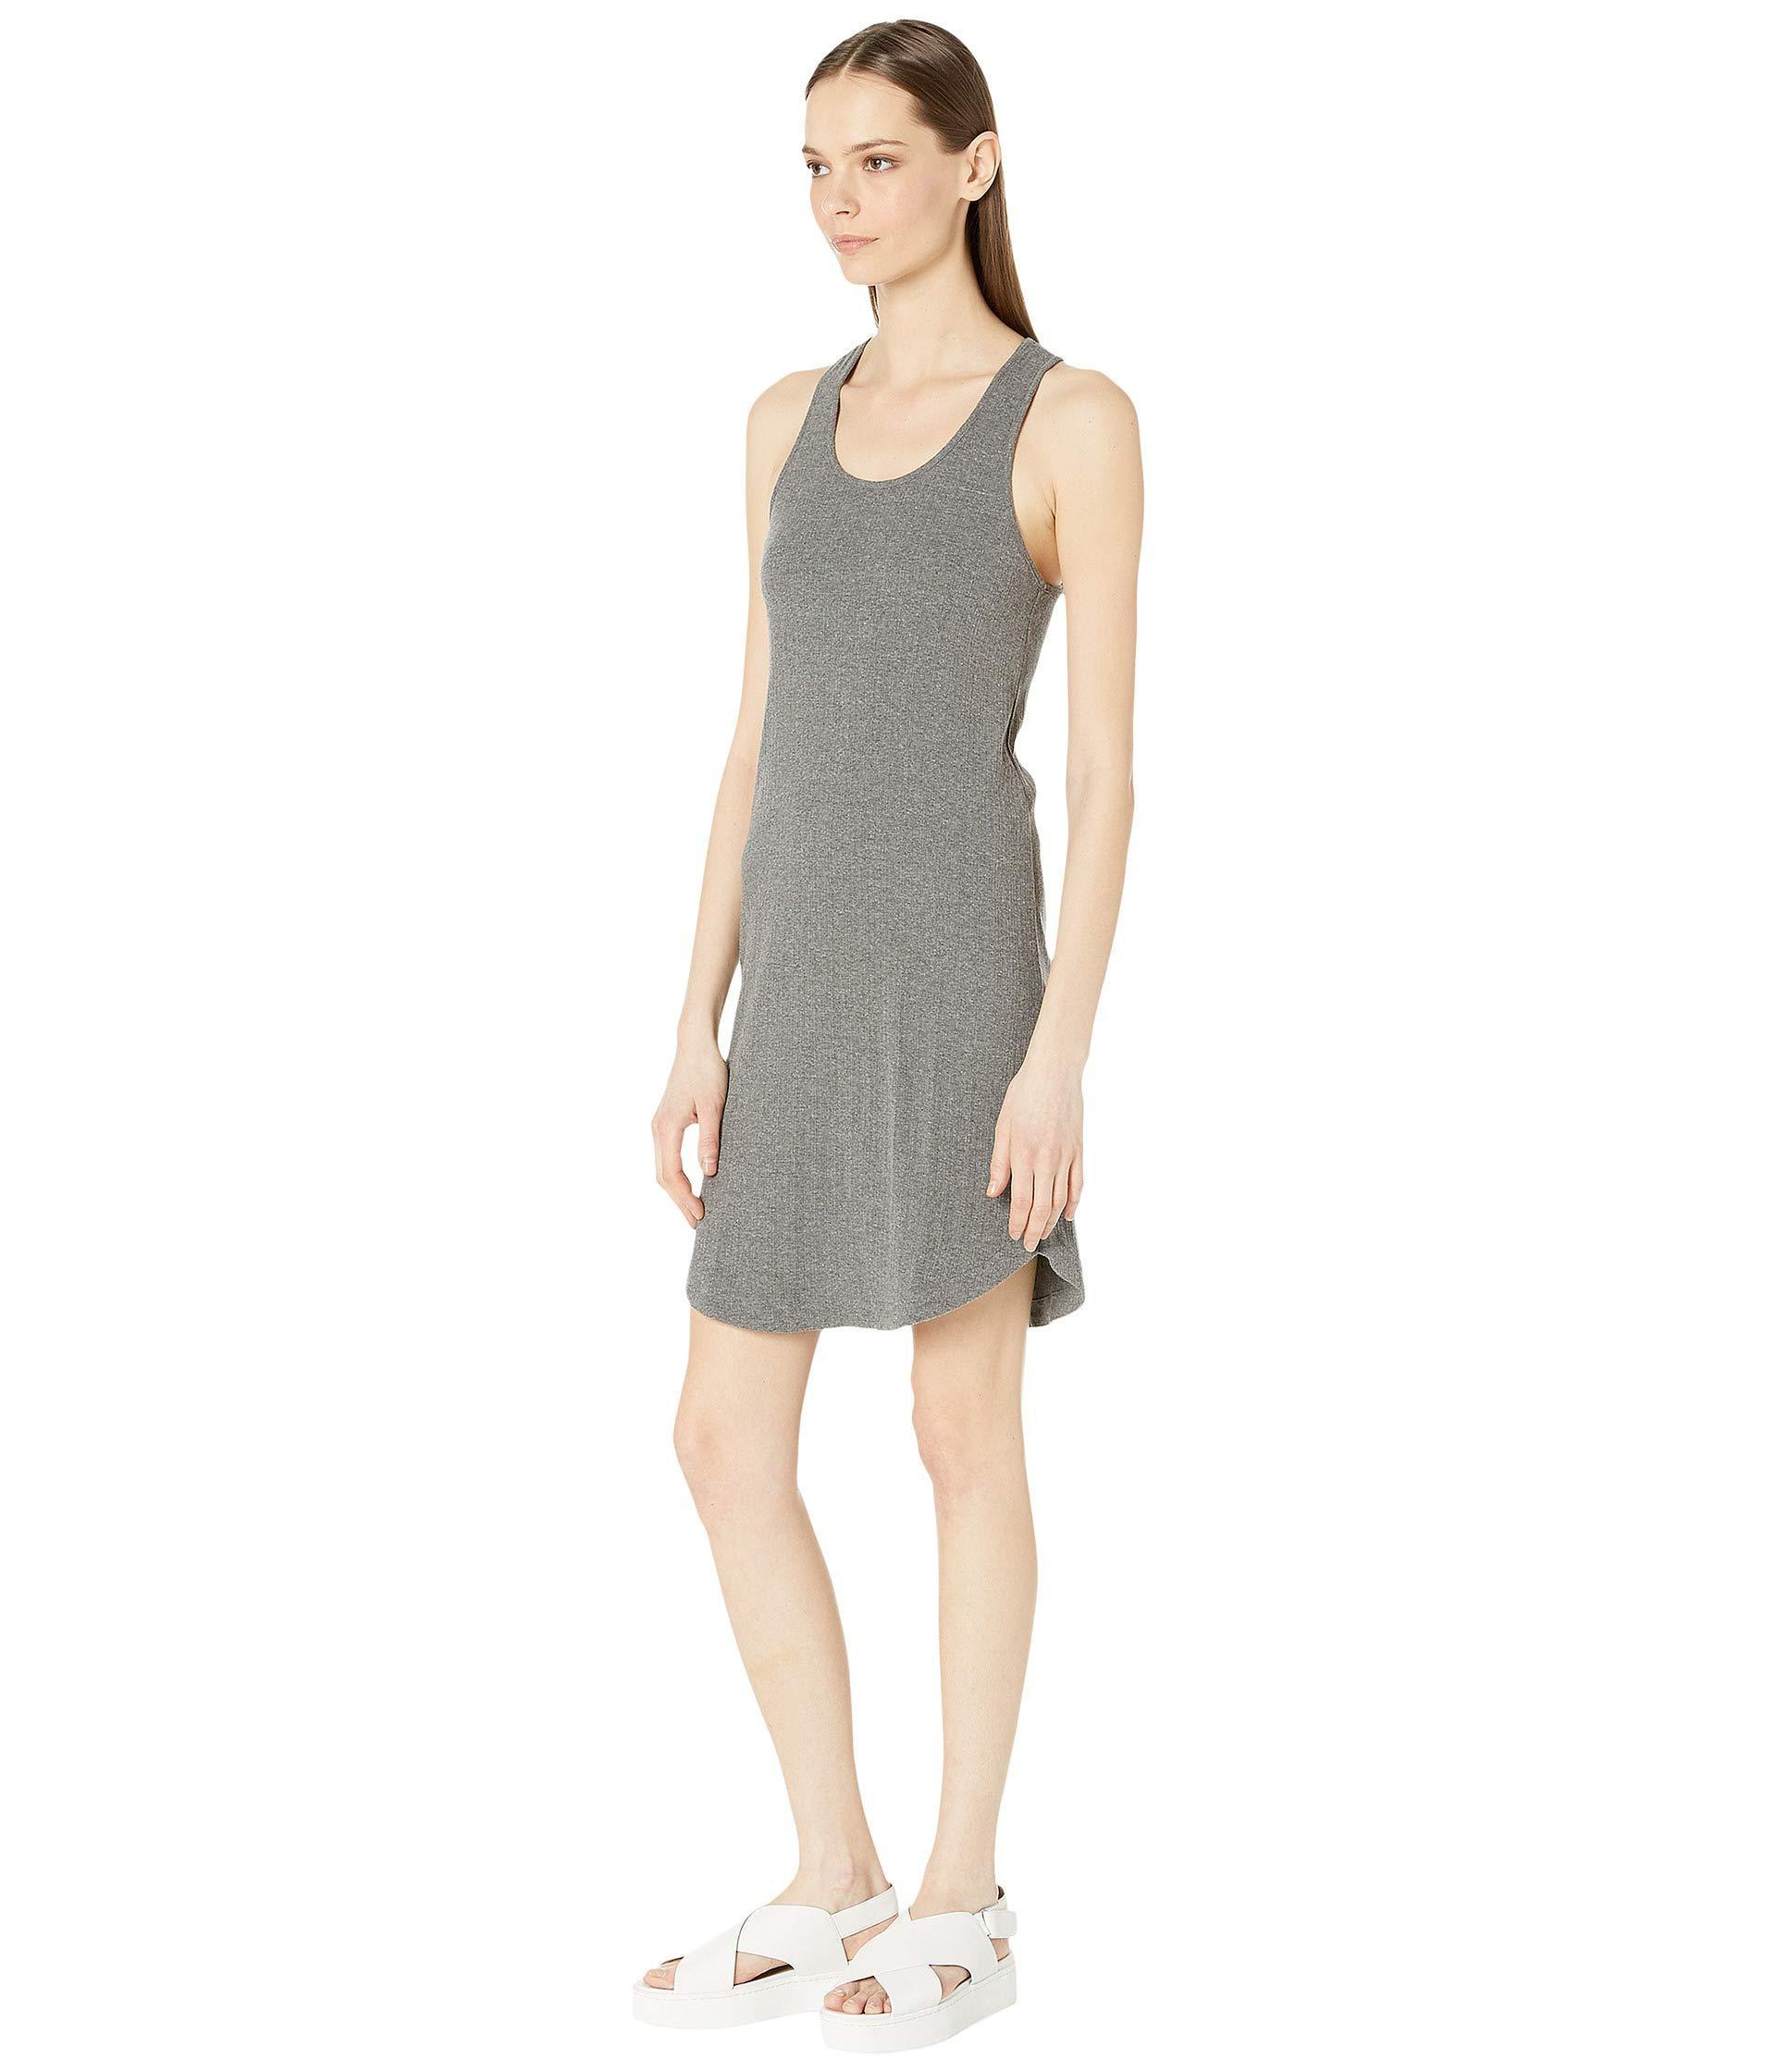 986b5d6176da0 Lyst - Skin Danya Chemise With Shelf Bra (medium Heather Grey) Women s  Pajama in Gray